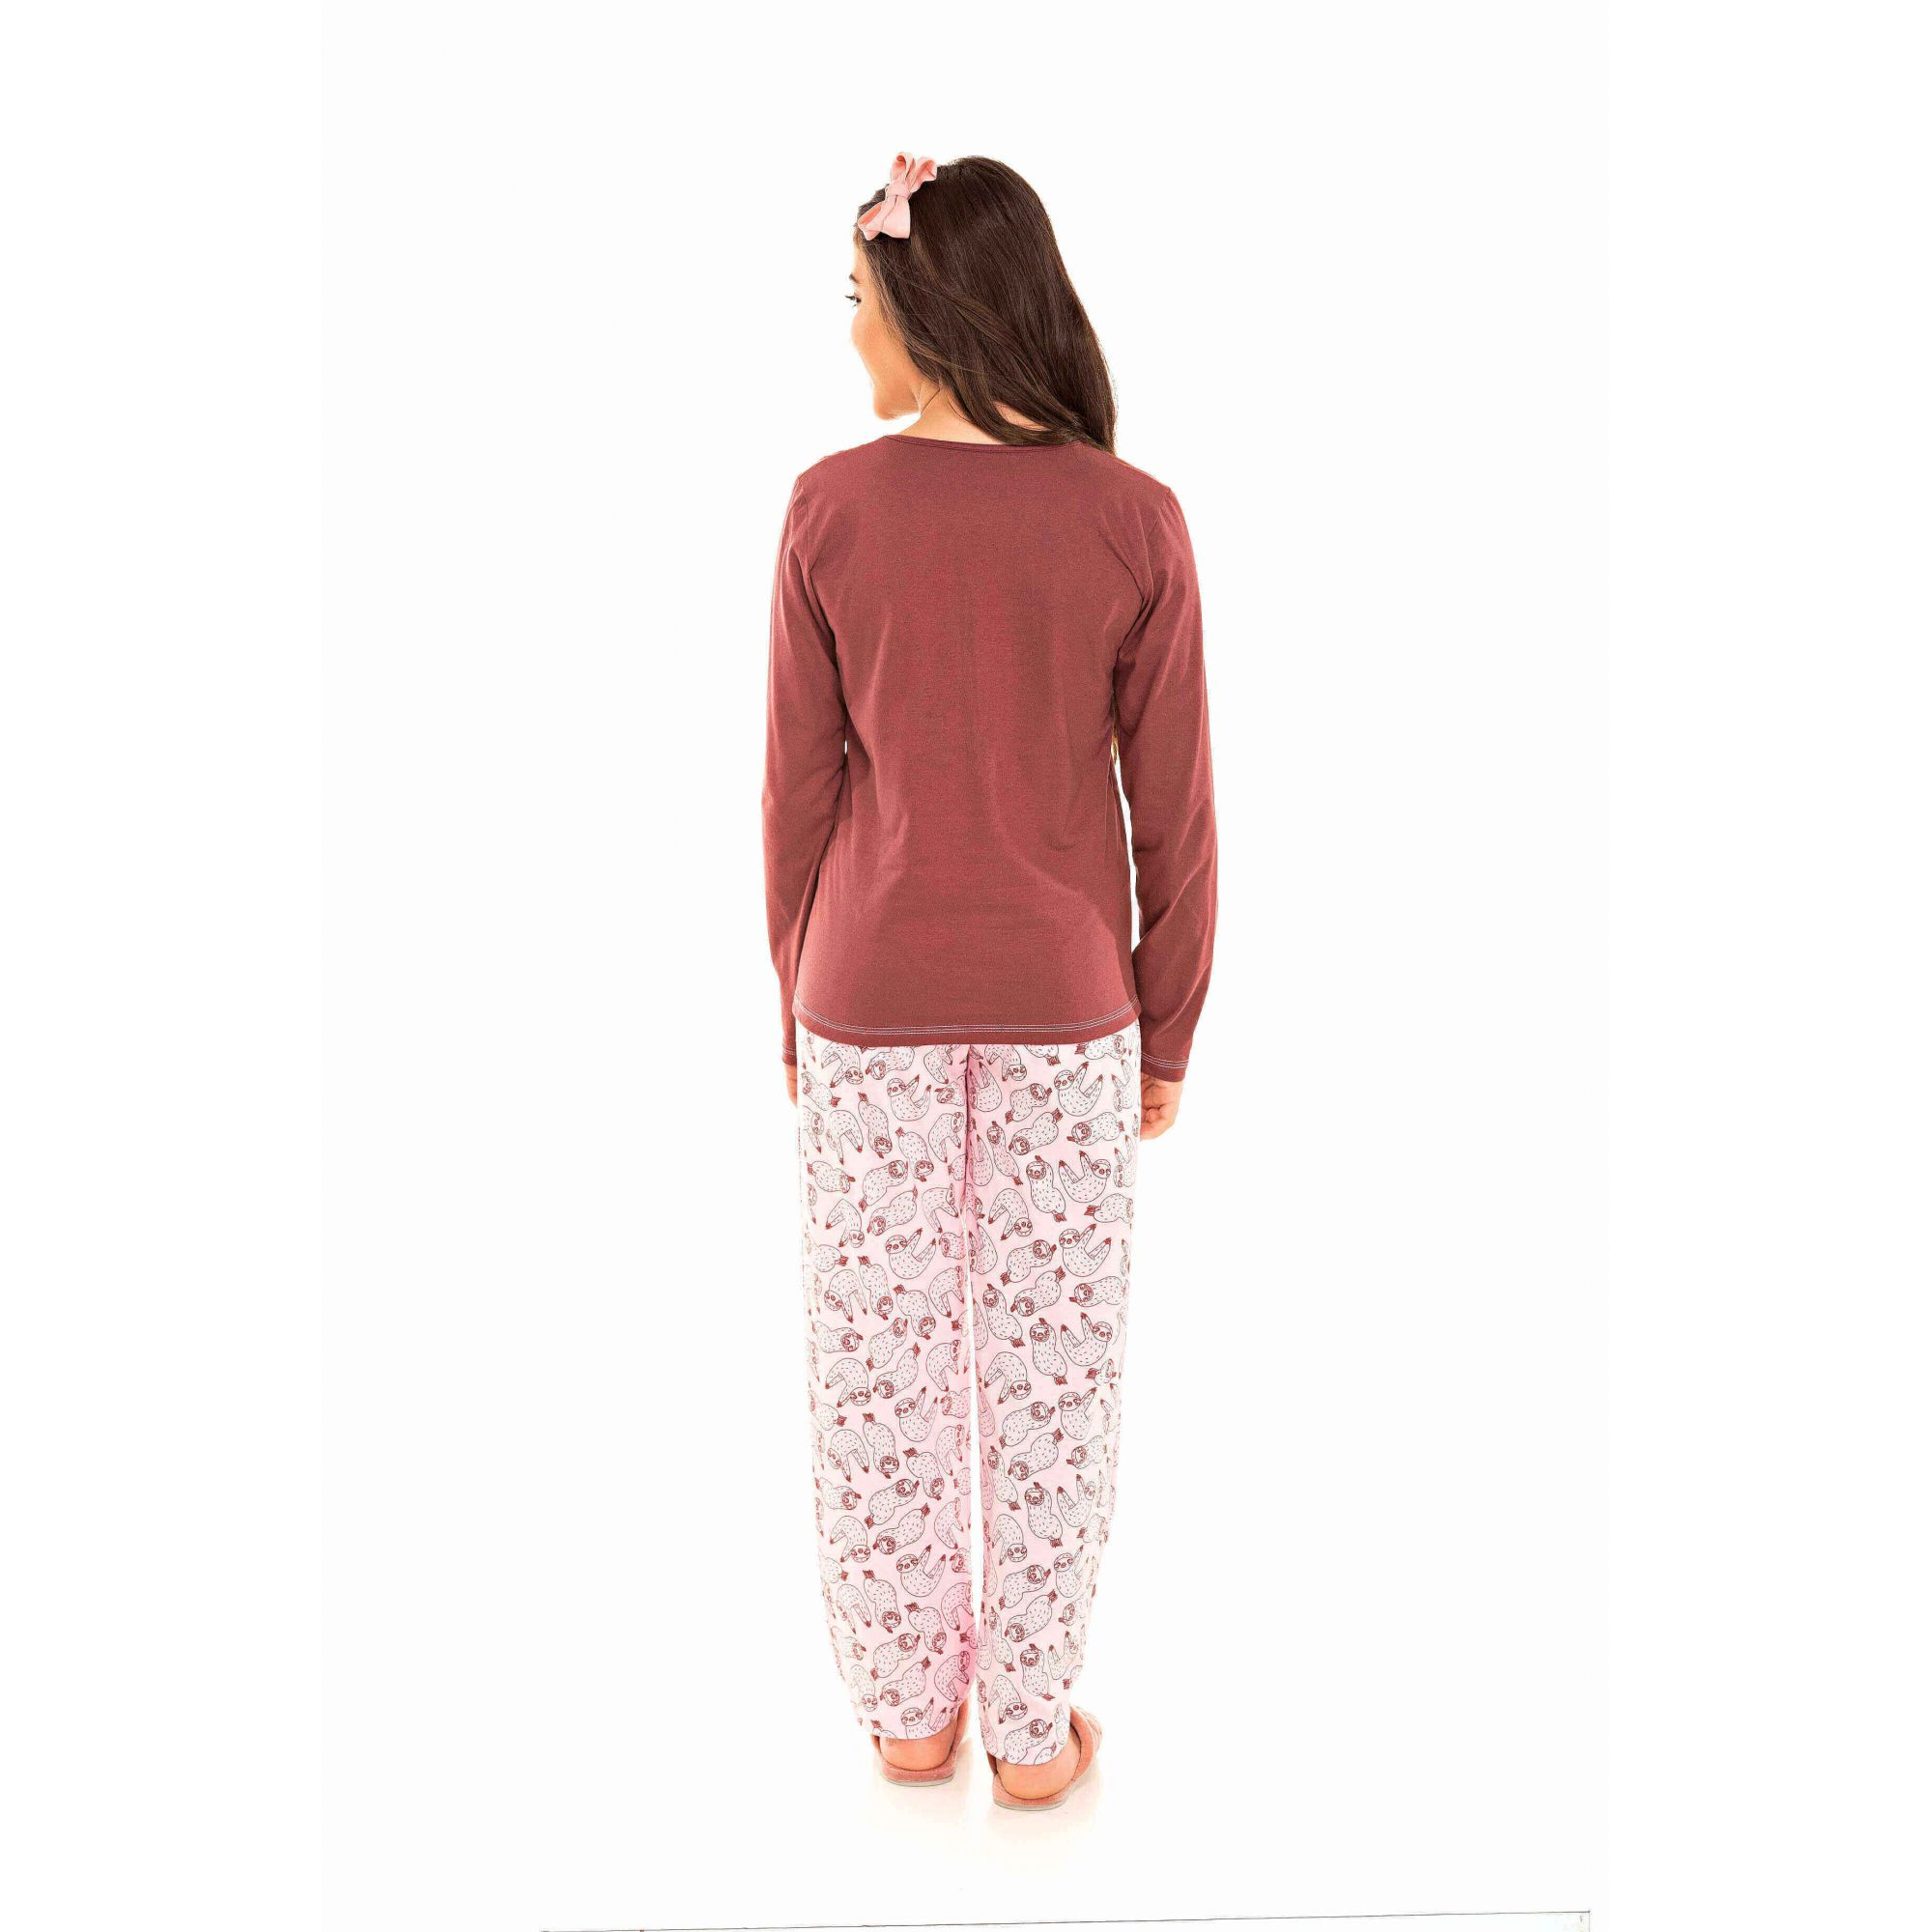 096/B - Pijama  Juvenil Feminino Bicho Preguiça